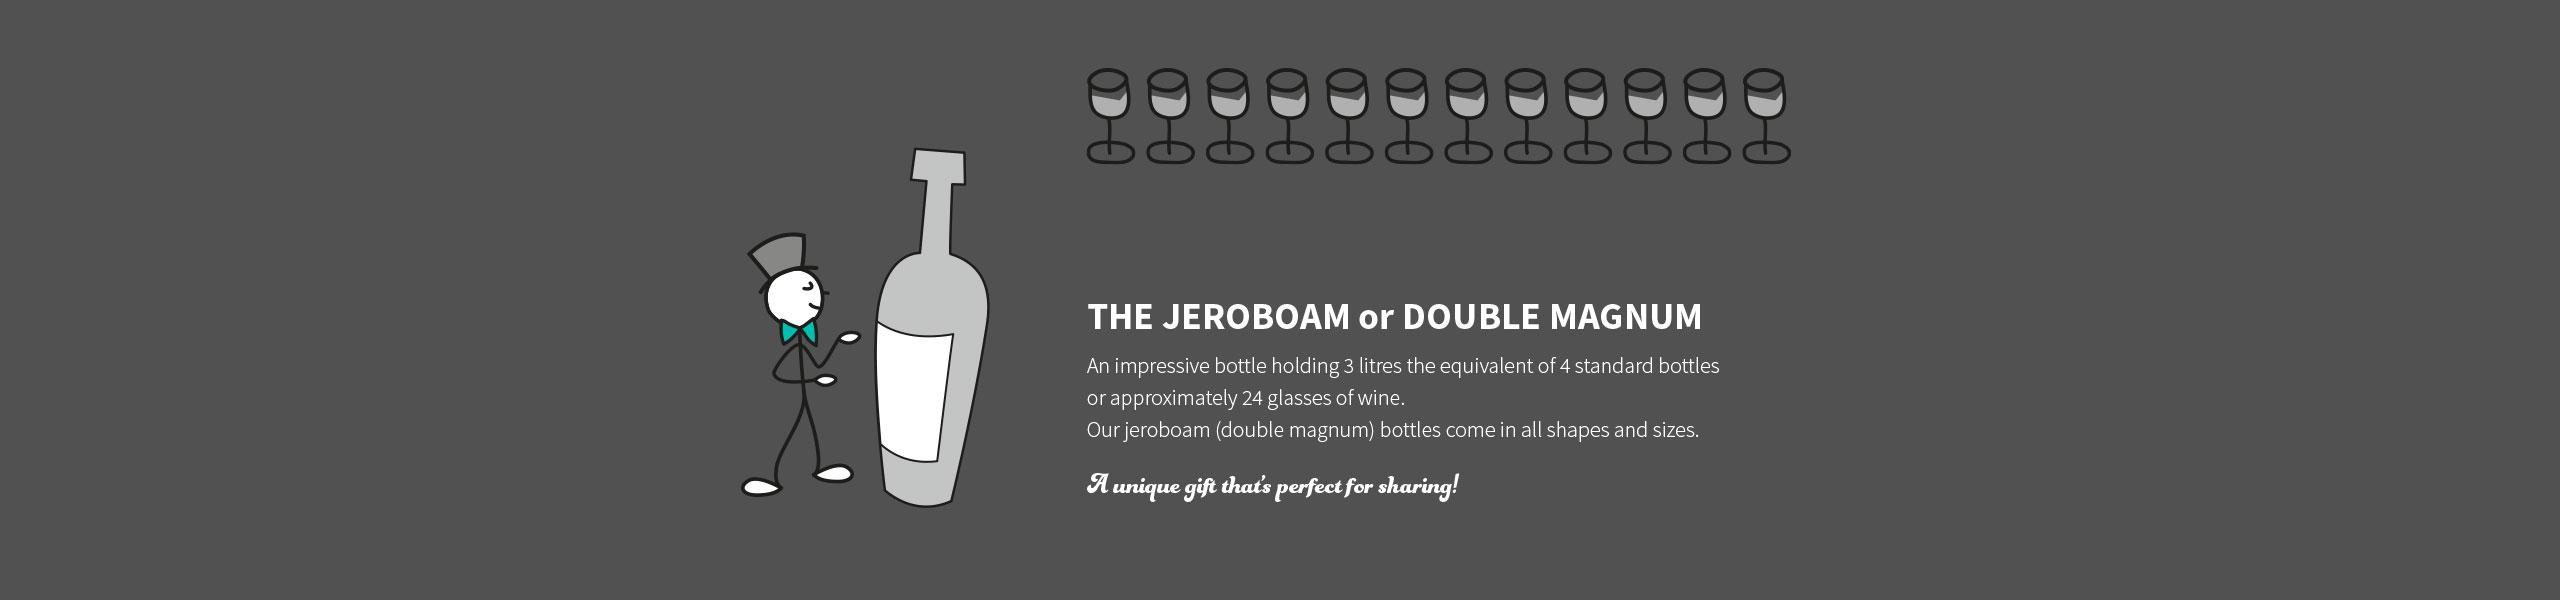 jeroboam double magnum bottle